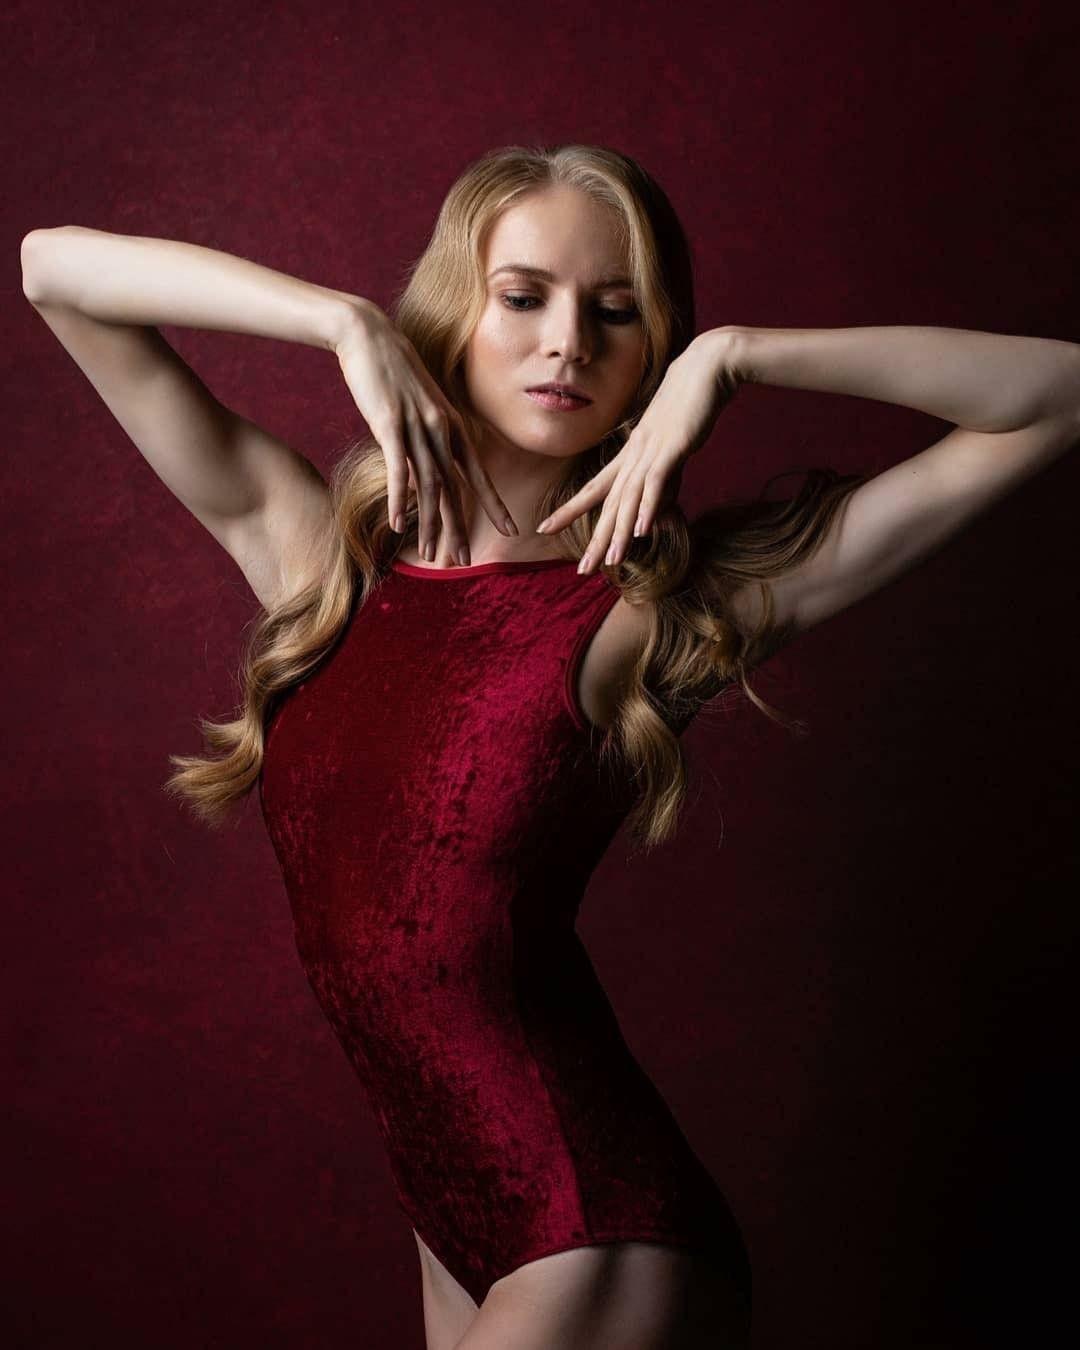 Hacked Iryna Bondarenko nudes (29 photo), Tits, Hot, Twitter, see through 2020